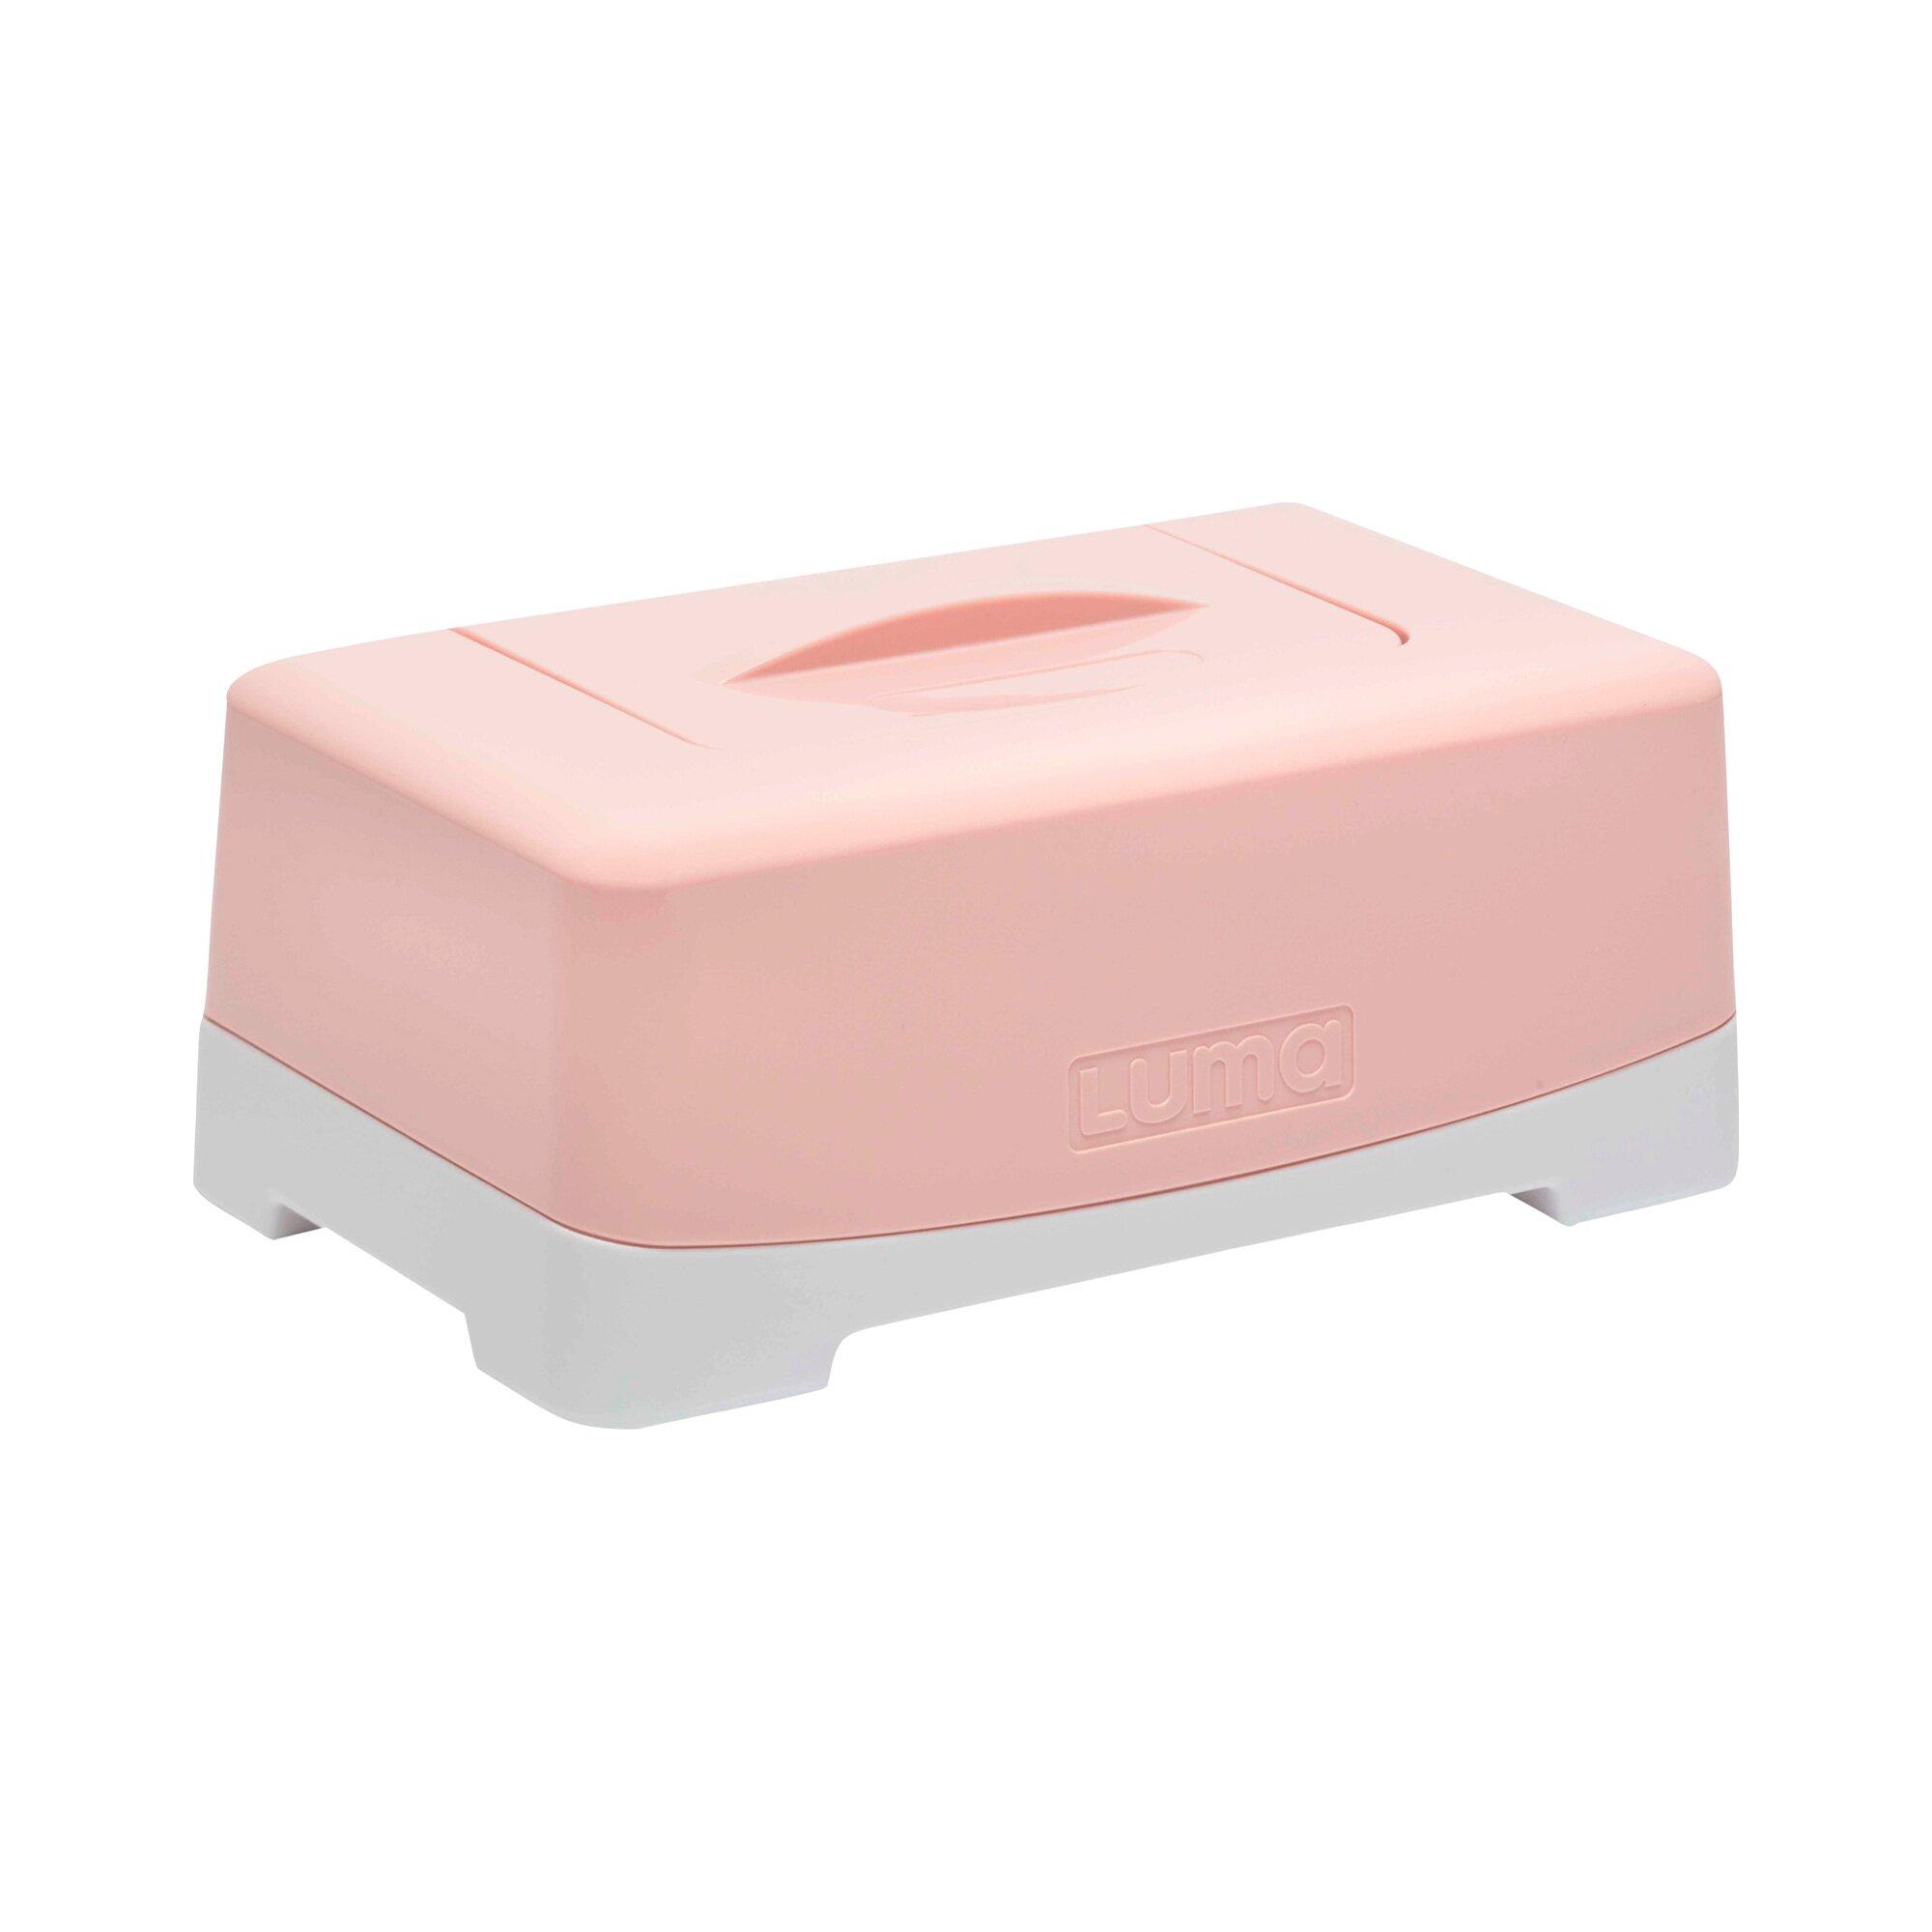 luma-babycare-feuchttucherbox